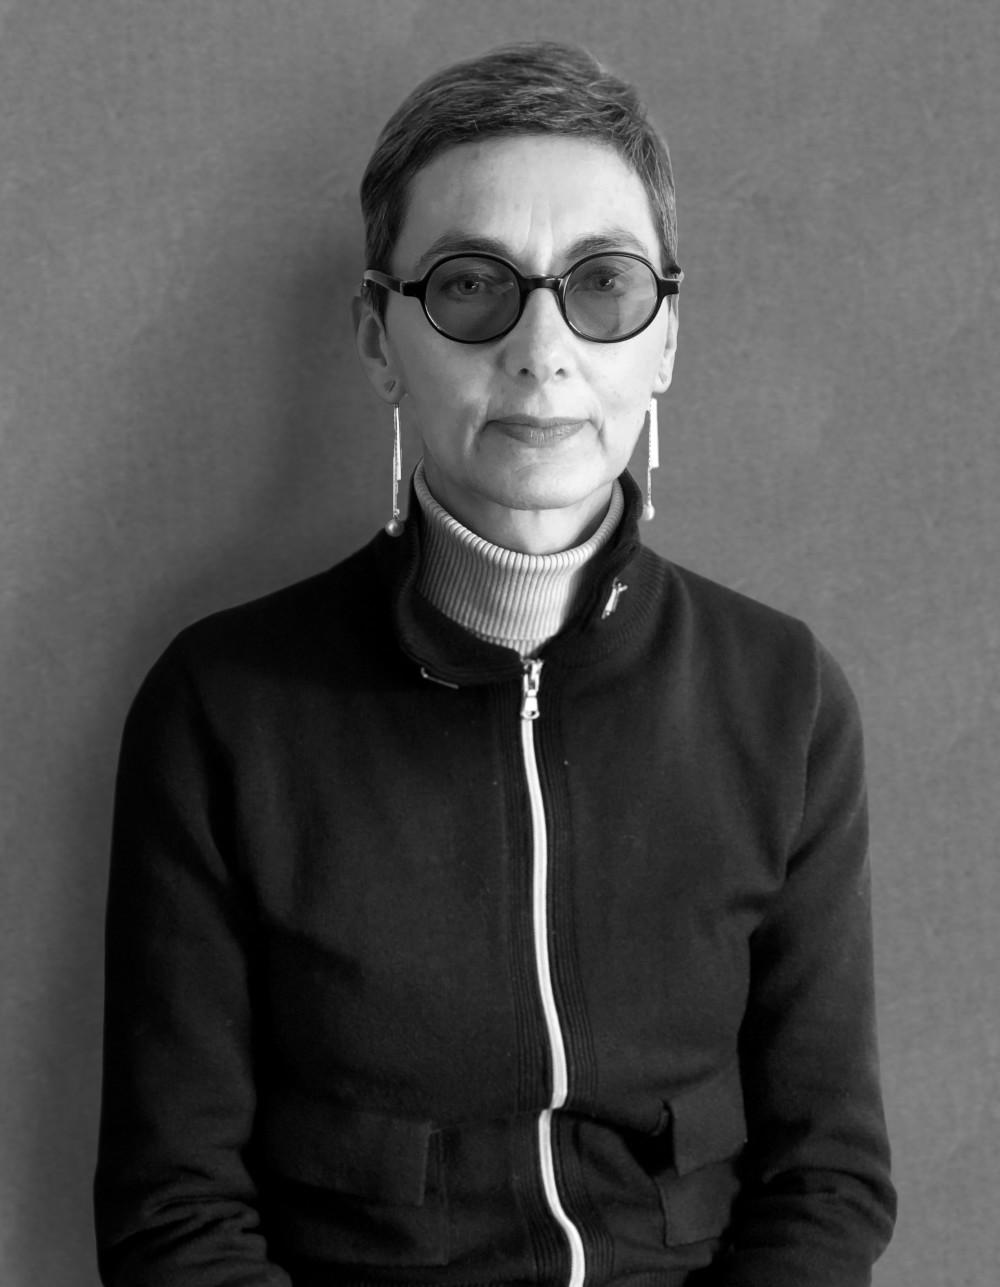 https://www.studioarco.eu/wp-content/uploads/2016/02/Cristina-1000x1287.jpg